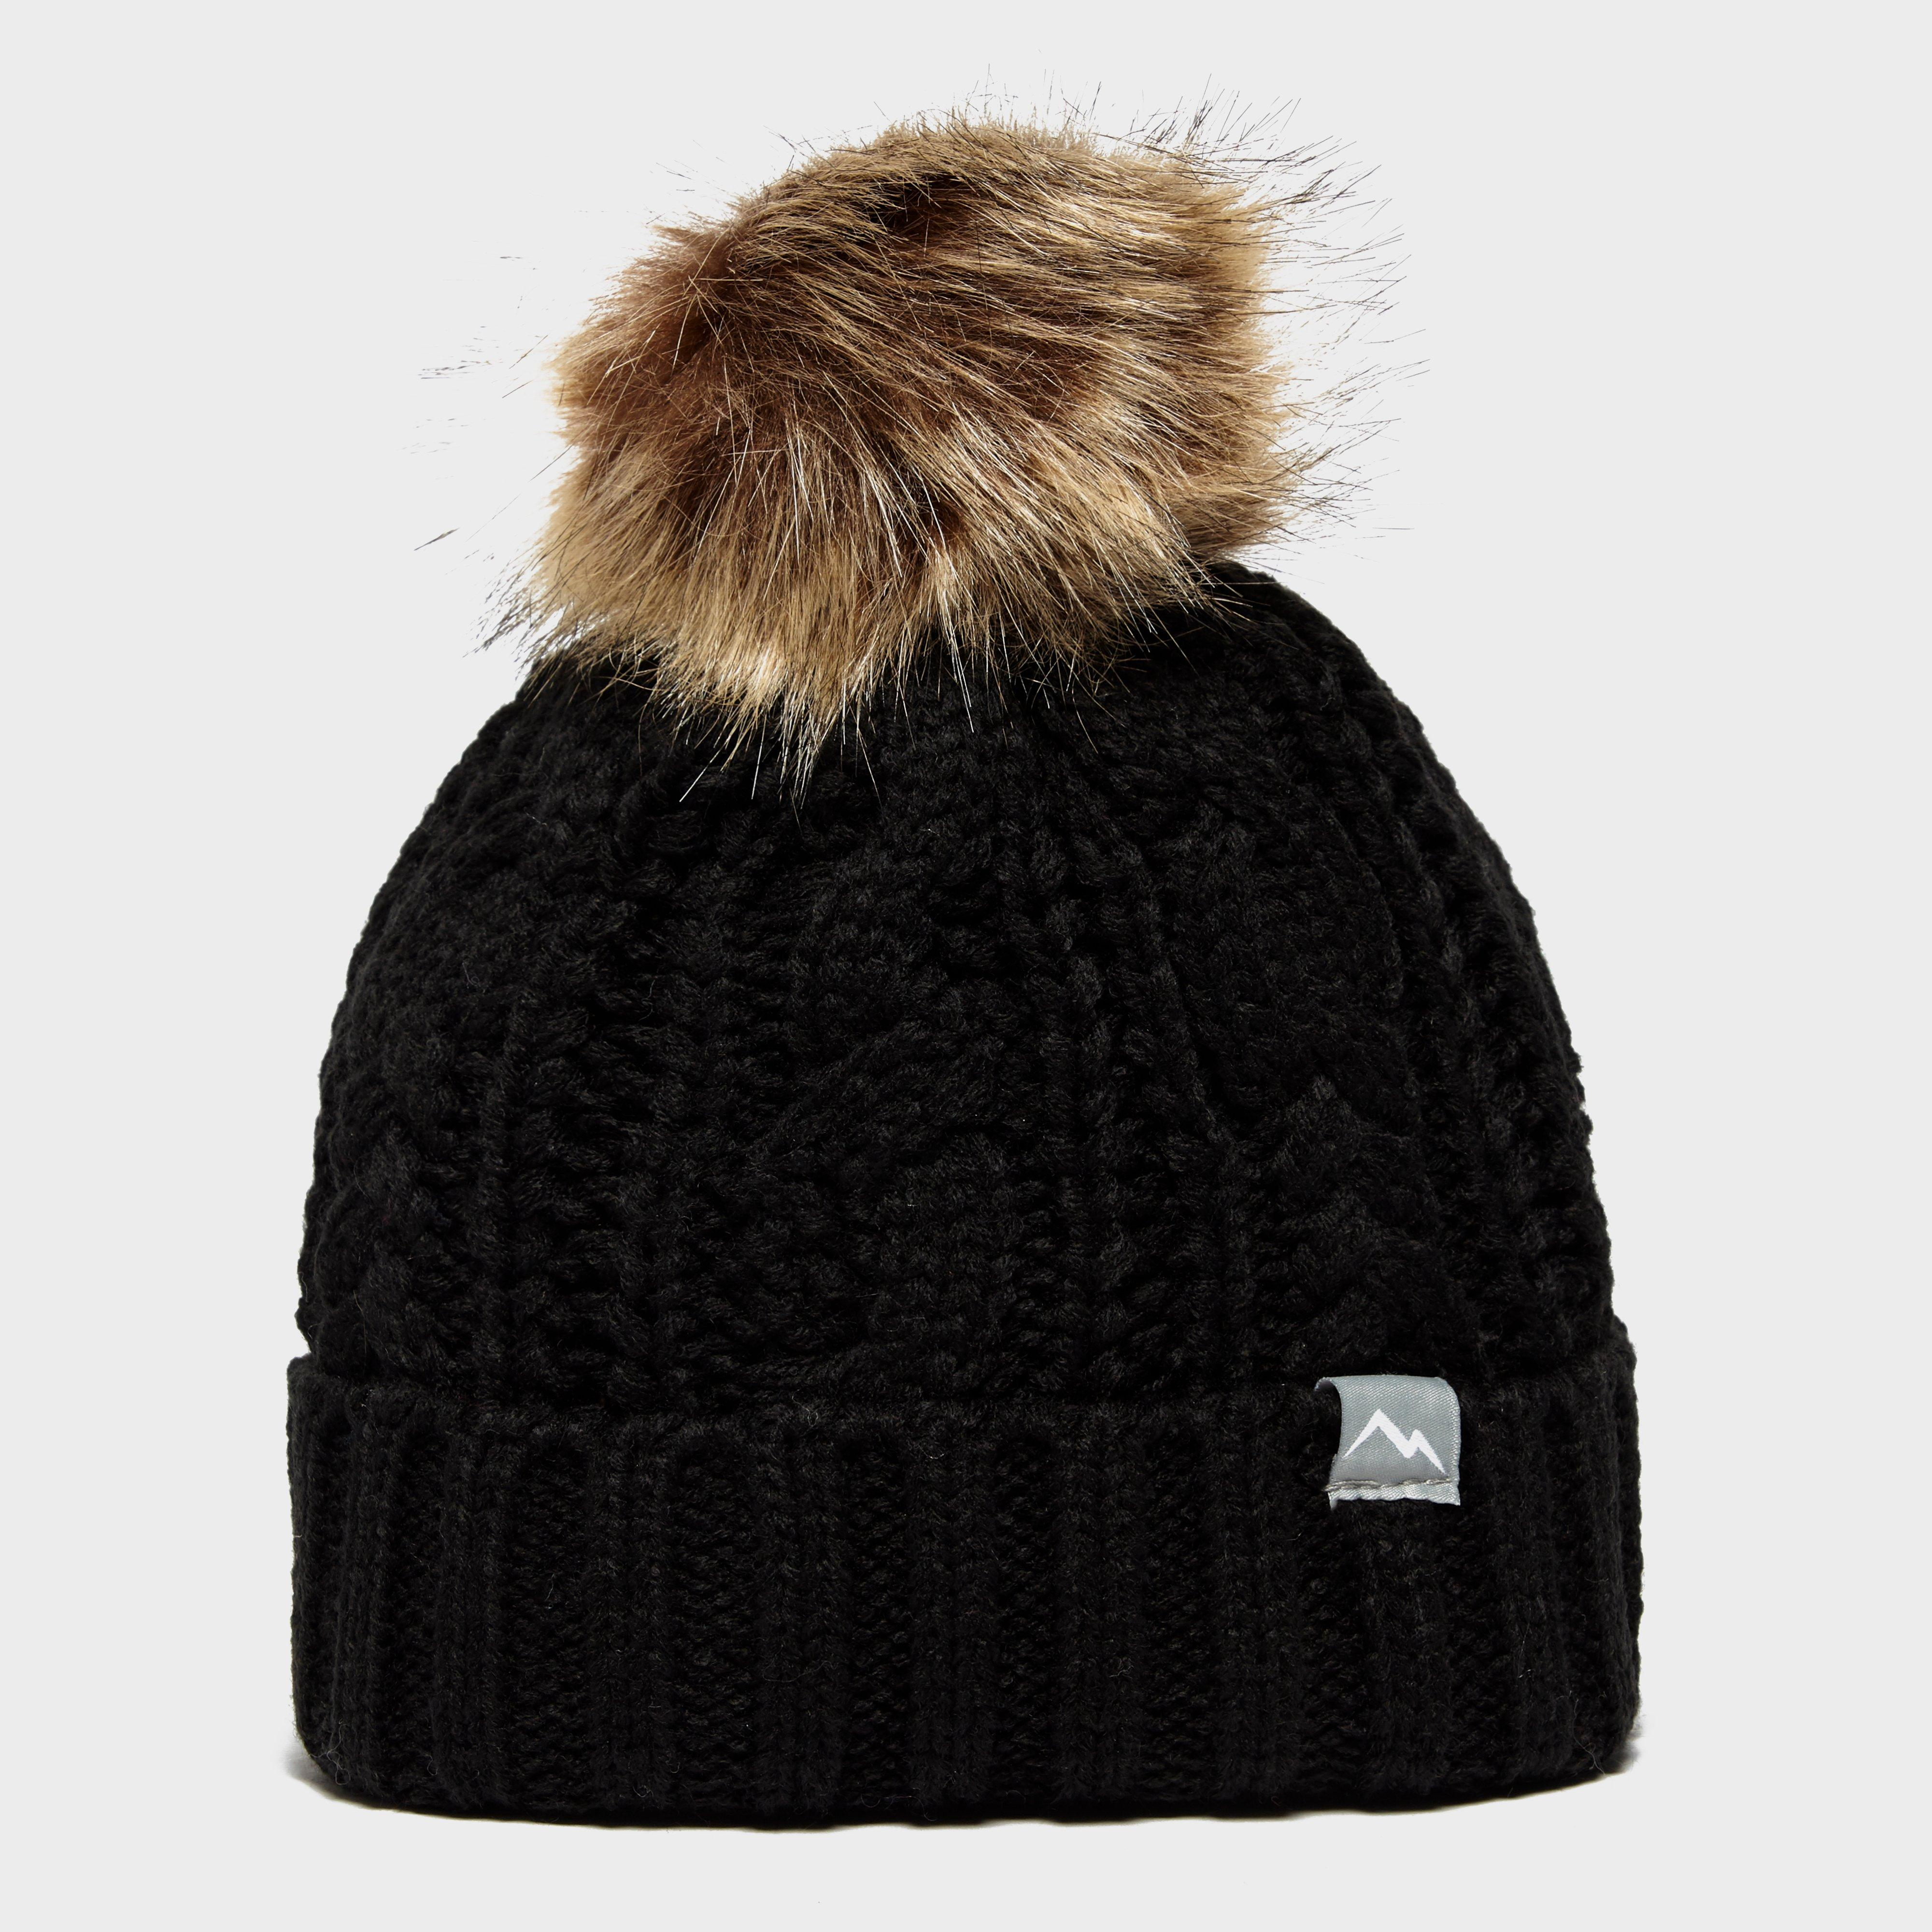 bdd35da6719 Peter Storm Girl s Maisie Bobble Hat